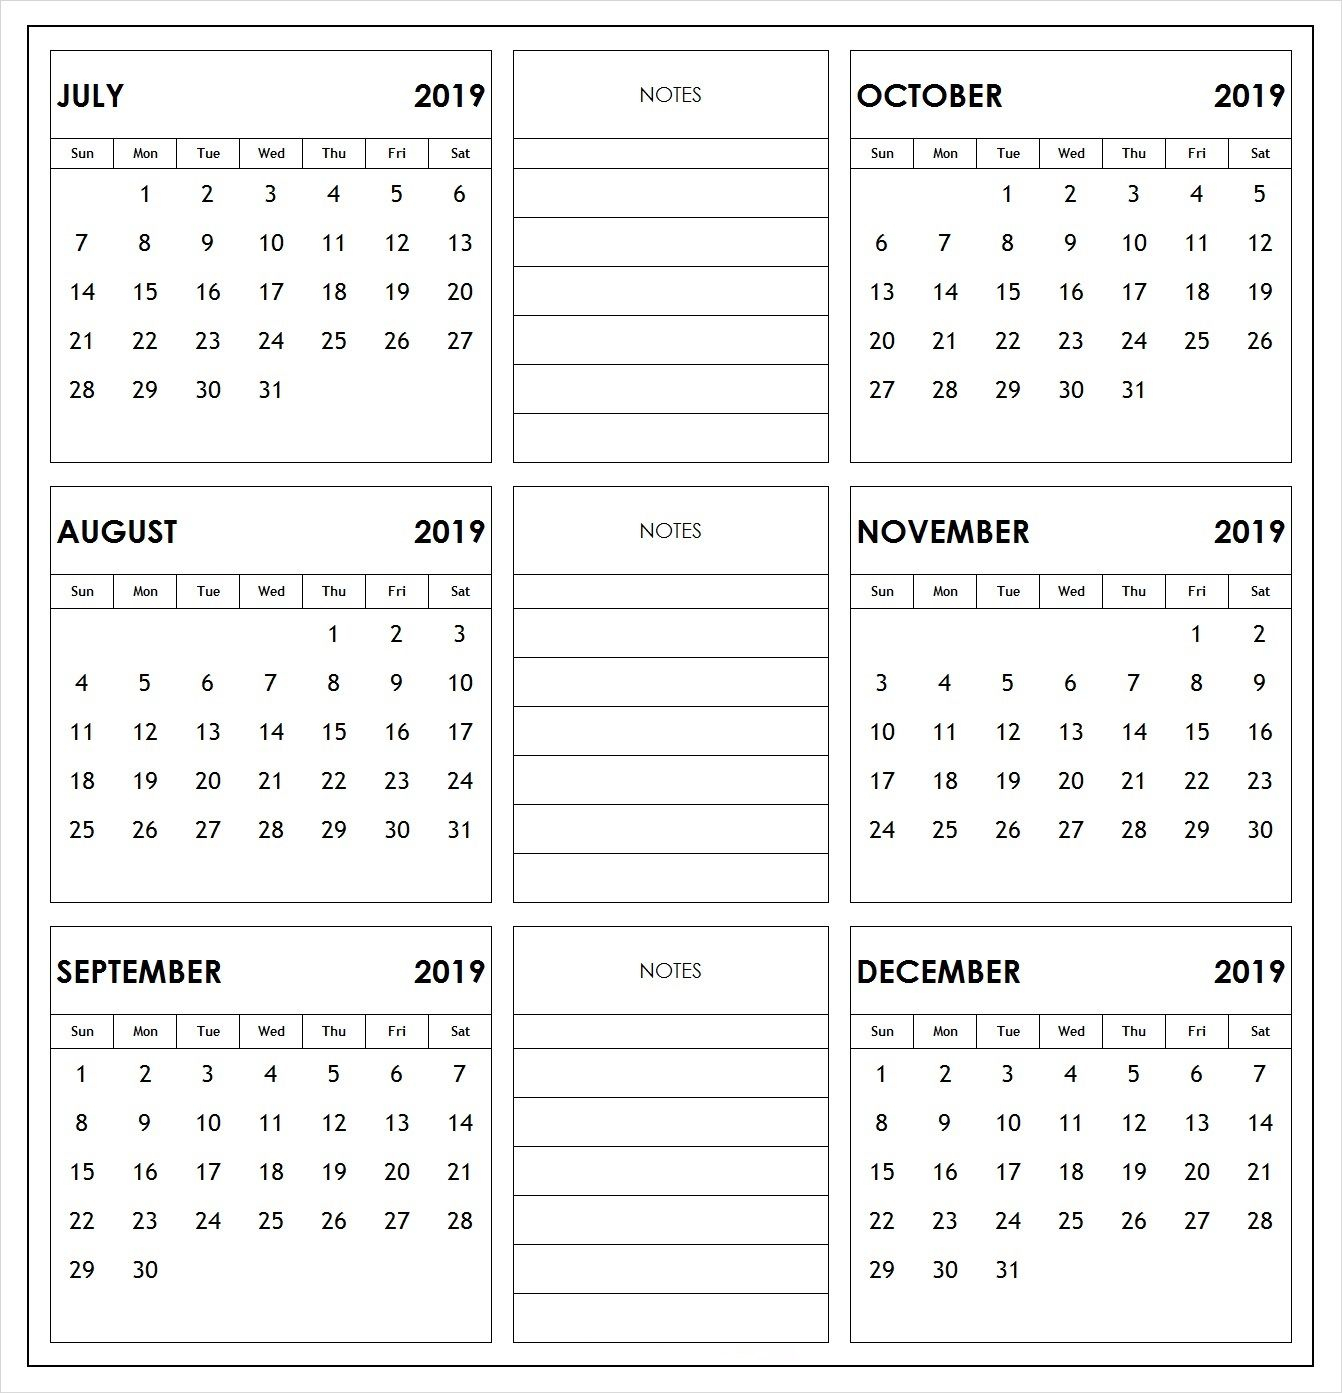 2019 Half Year Print Calendar | 2019 Calendars In 2019